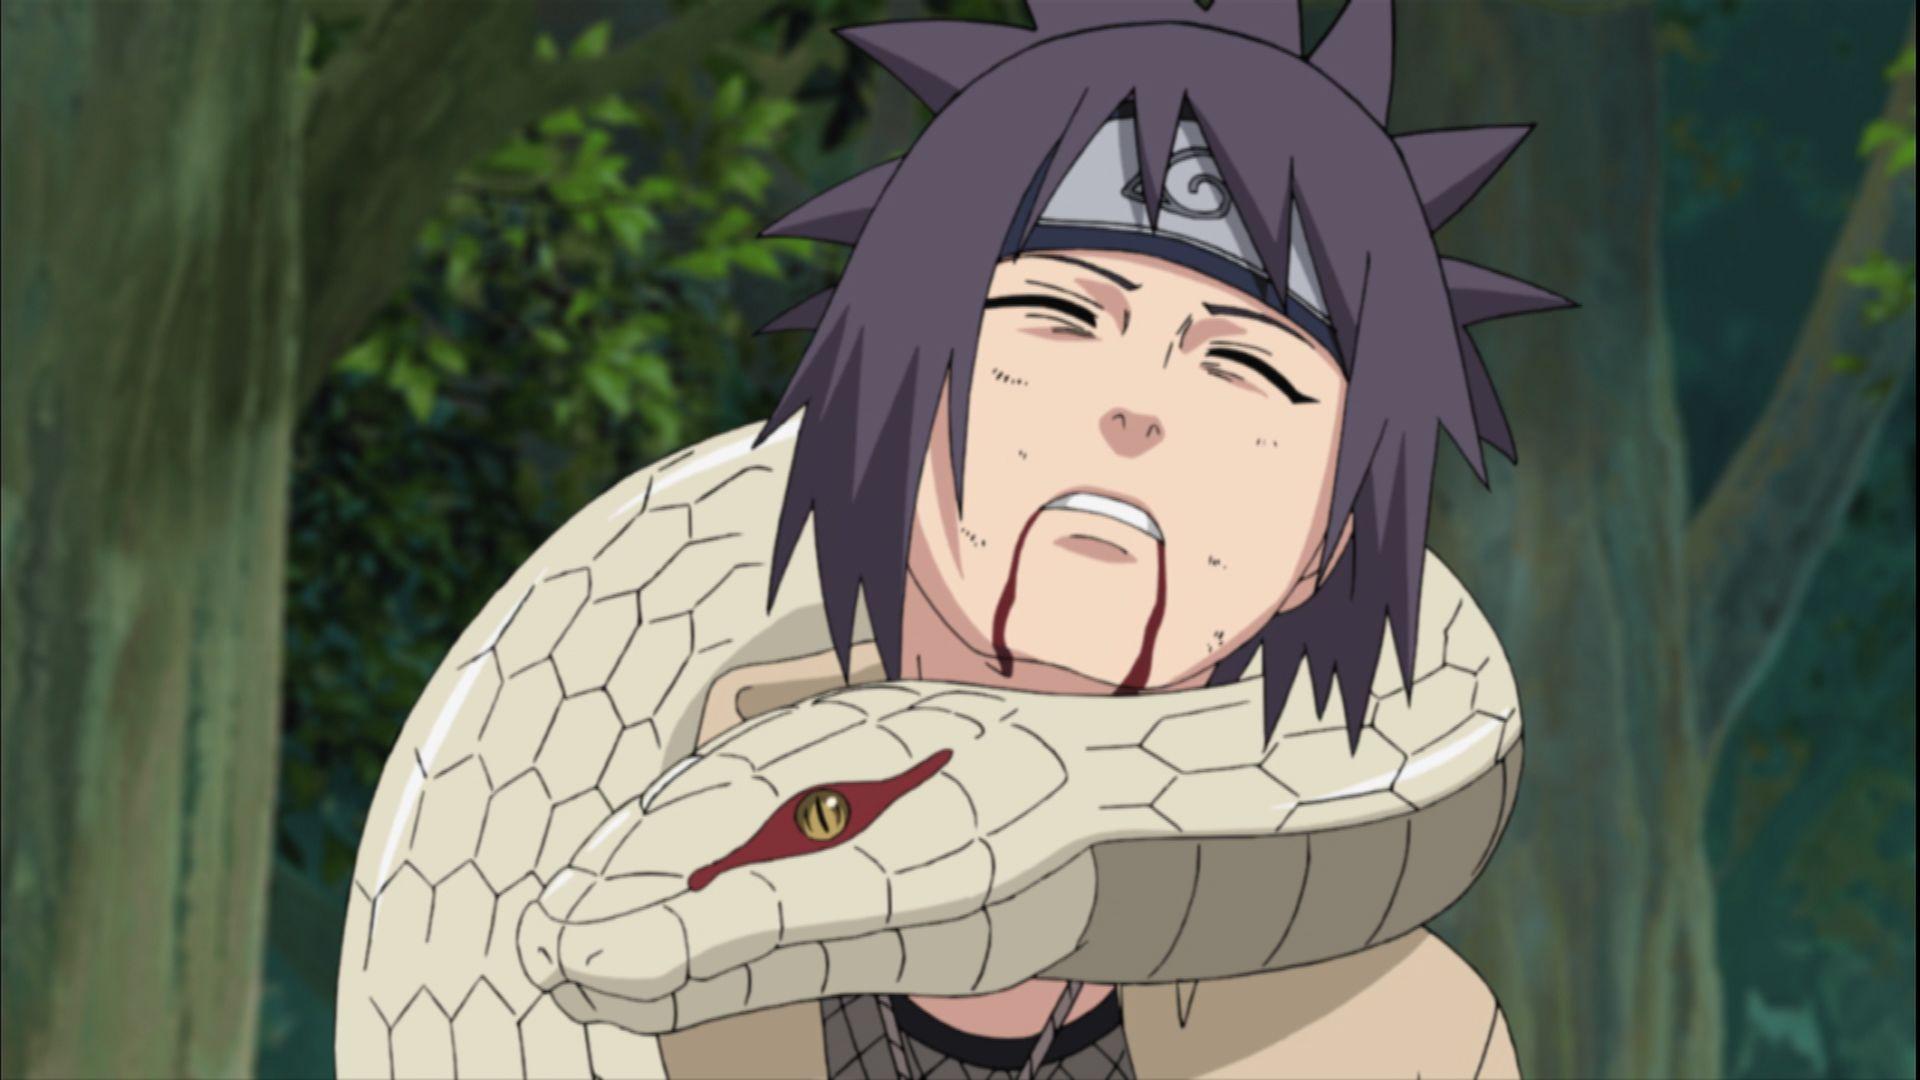 Watch Naruto: Shippuden on Adult Swim